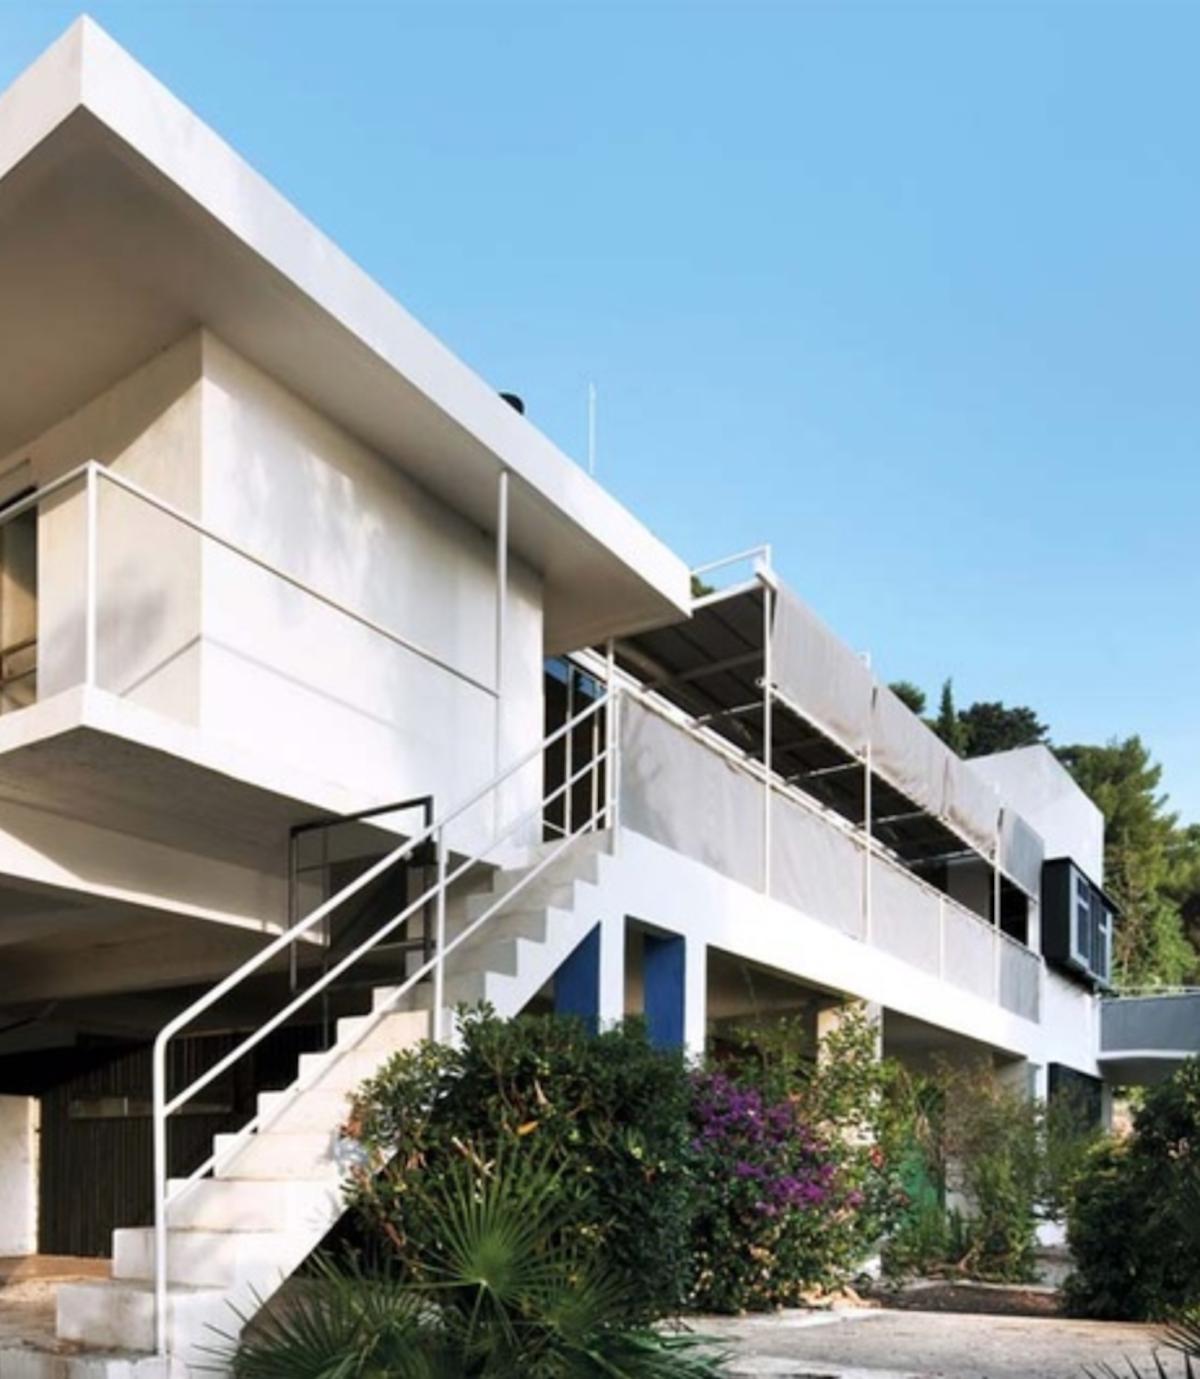 villa E-1027 eileen gray architecture maison design - blog déco - clemaroundthecorner